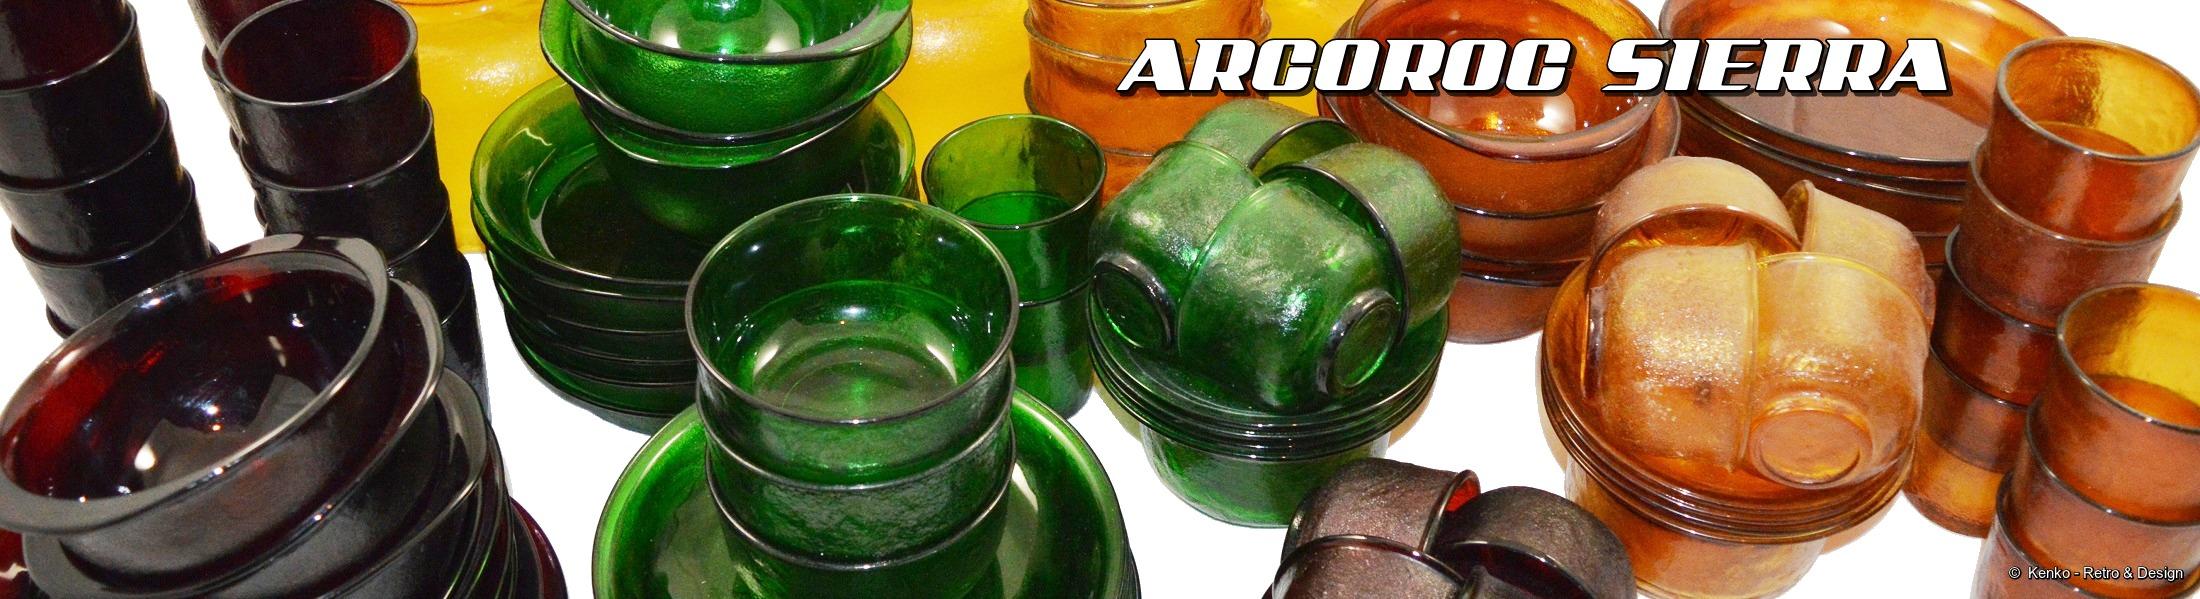 Arcoroc Siërra